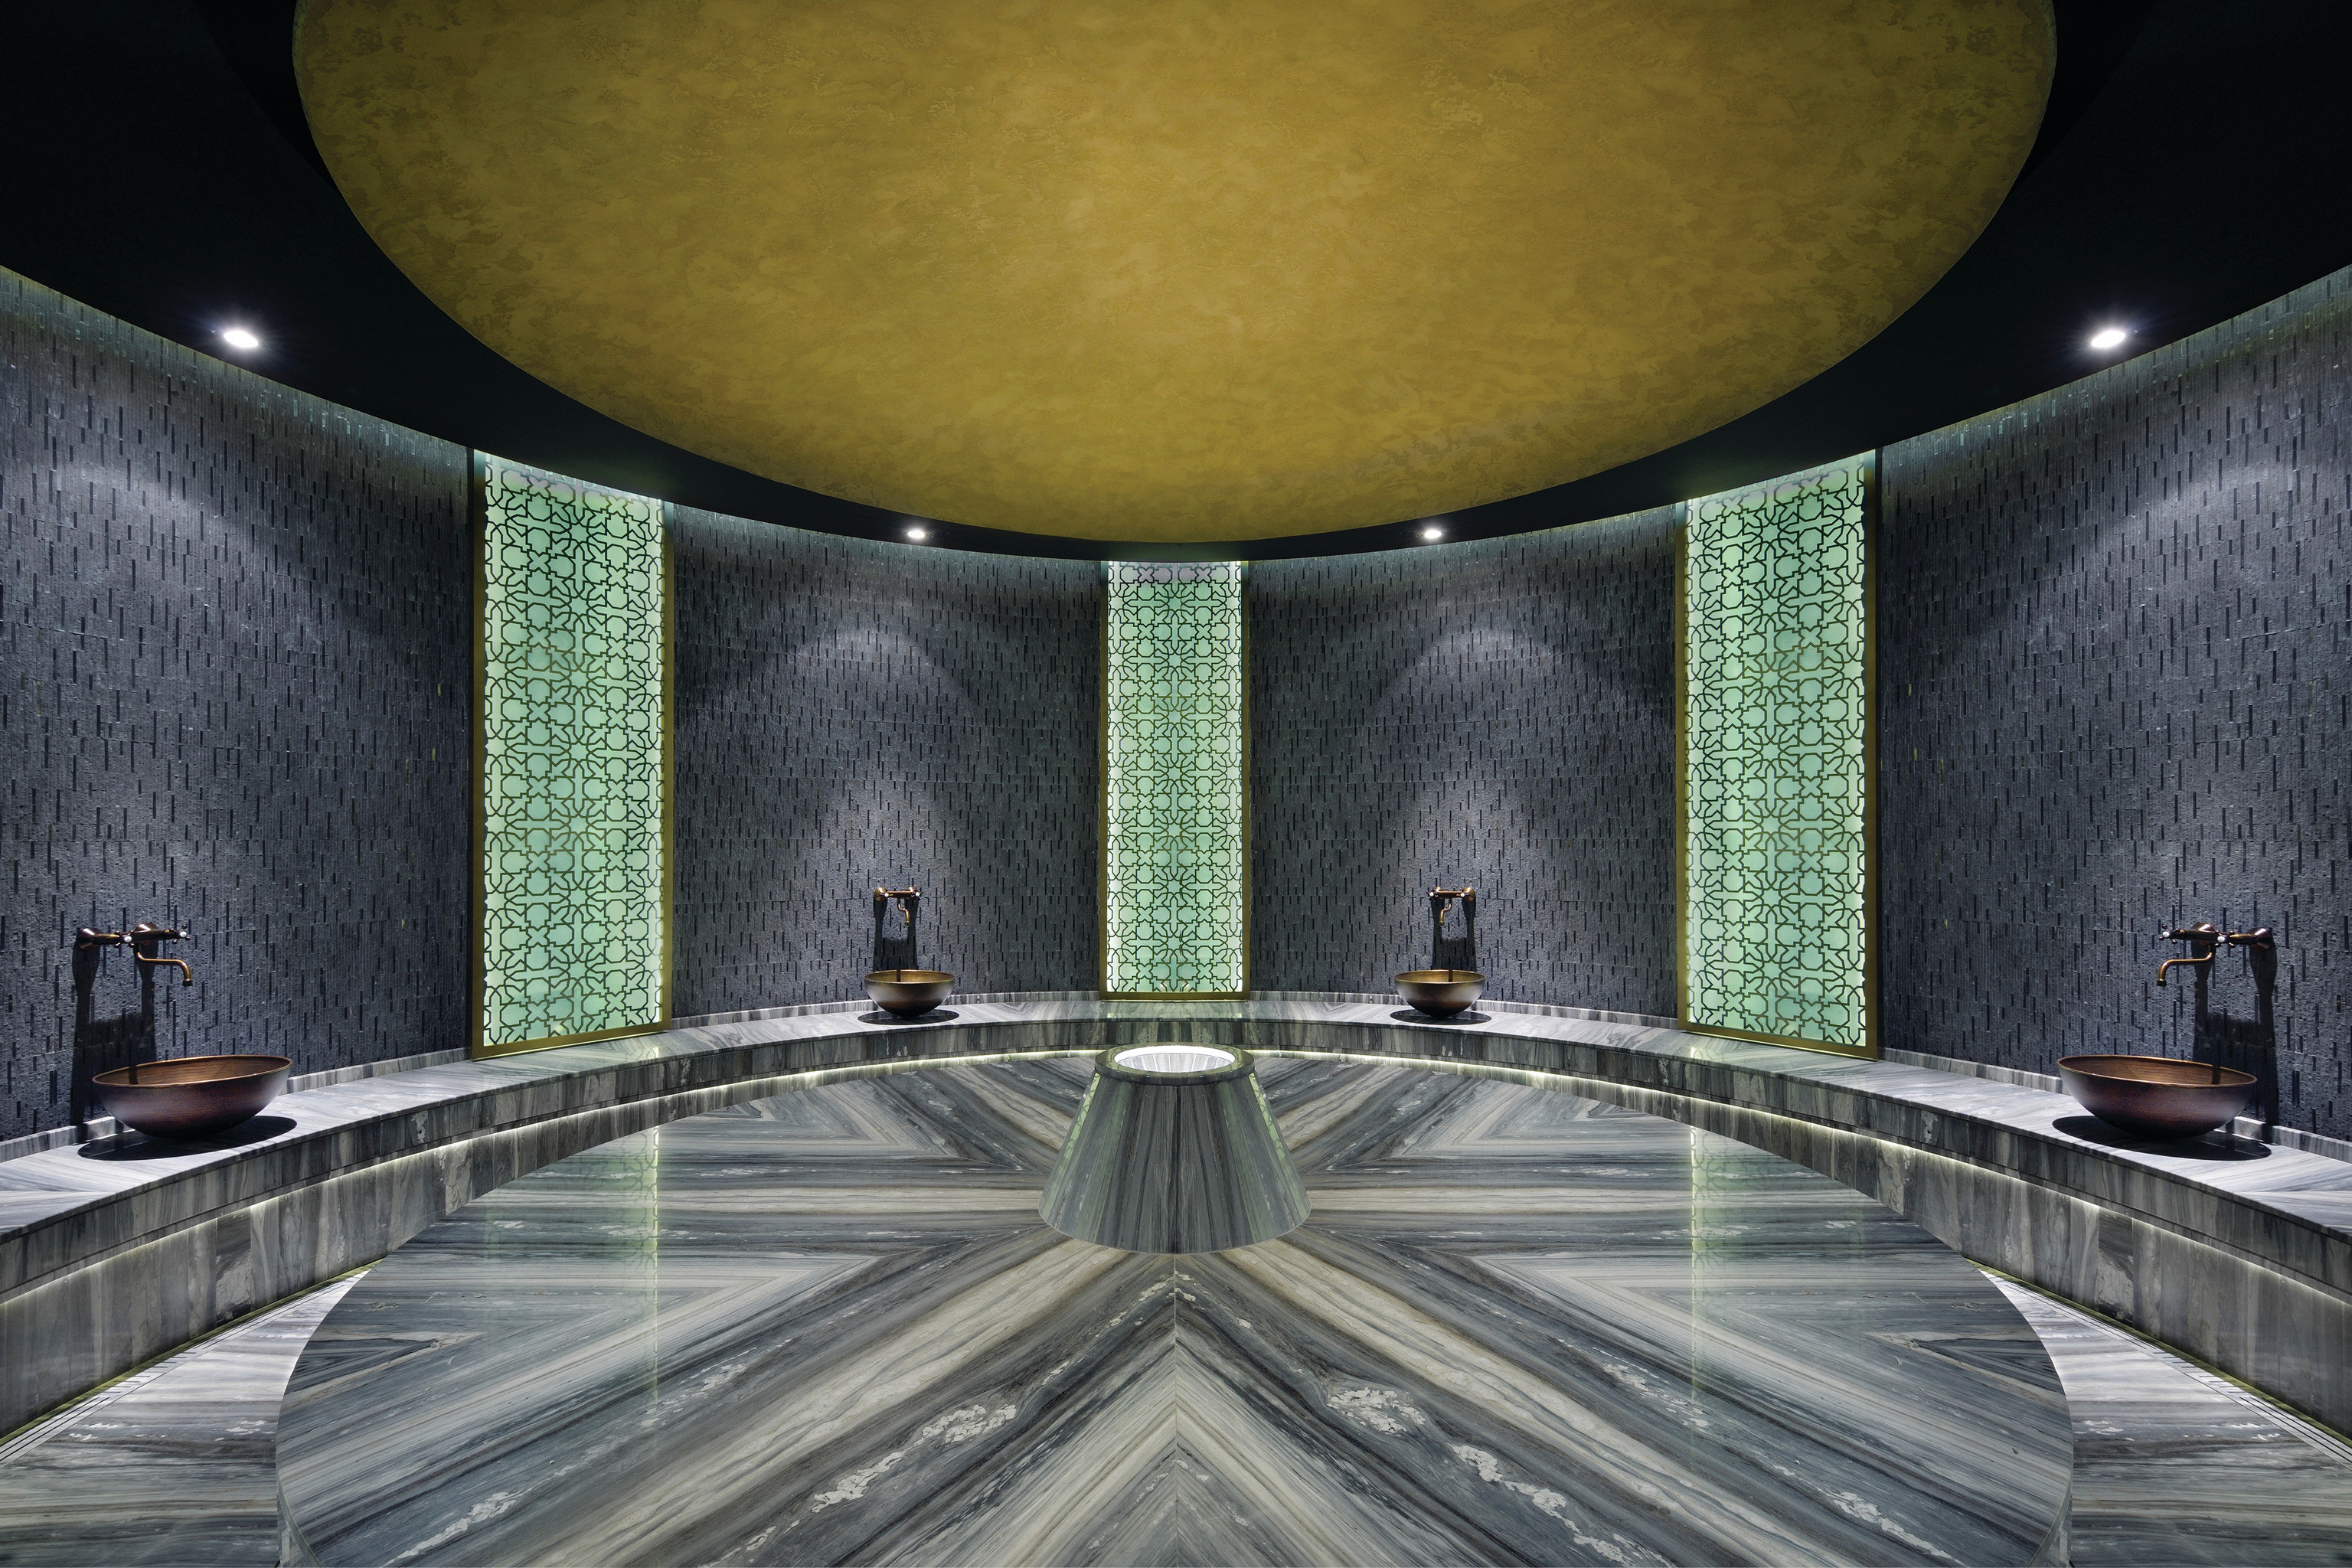 Health + Wellness Trip Ideas indoor Architecture interior design green ceiling space symmetry Lobby estate daylighting